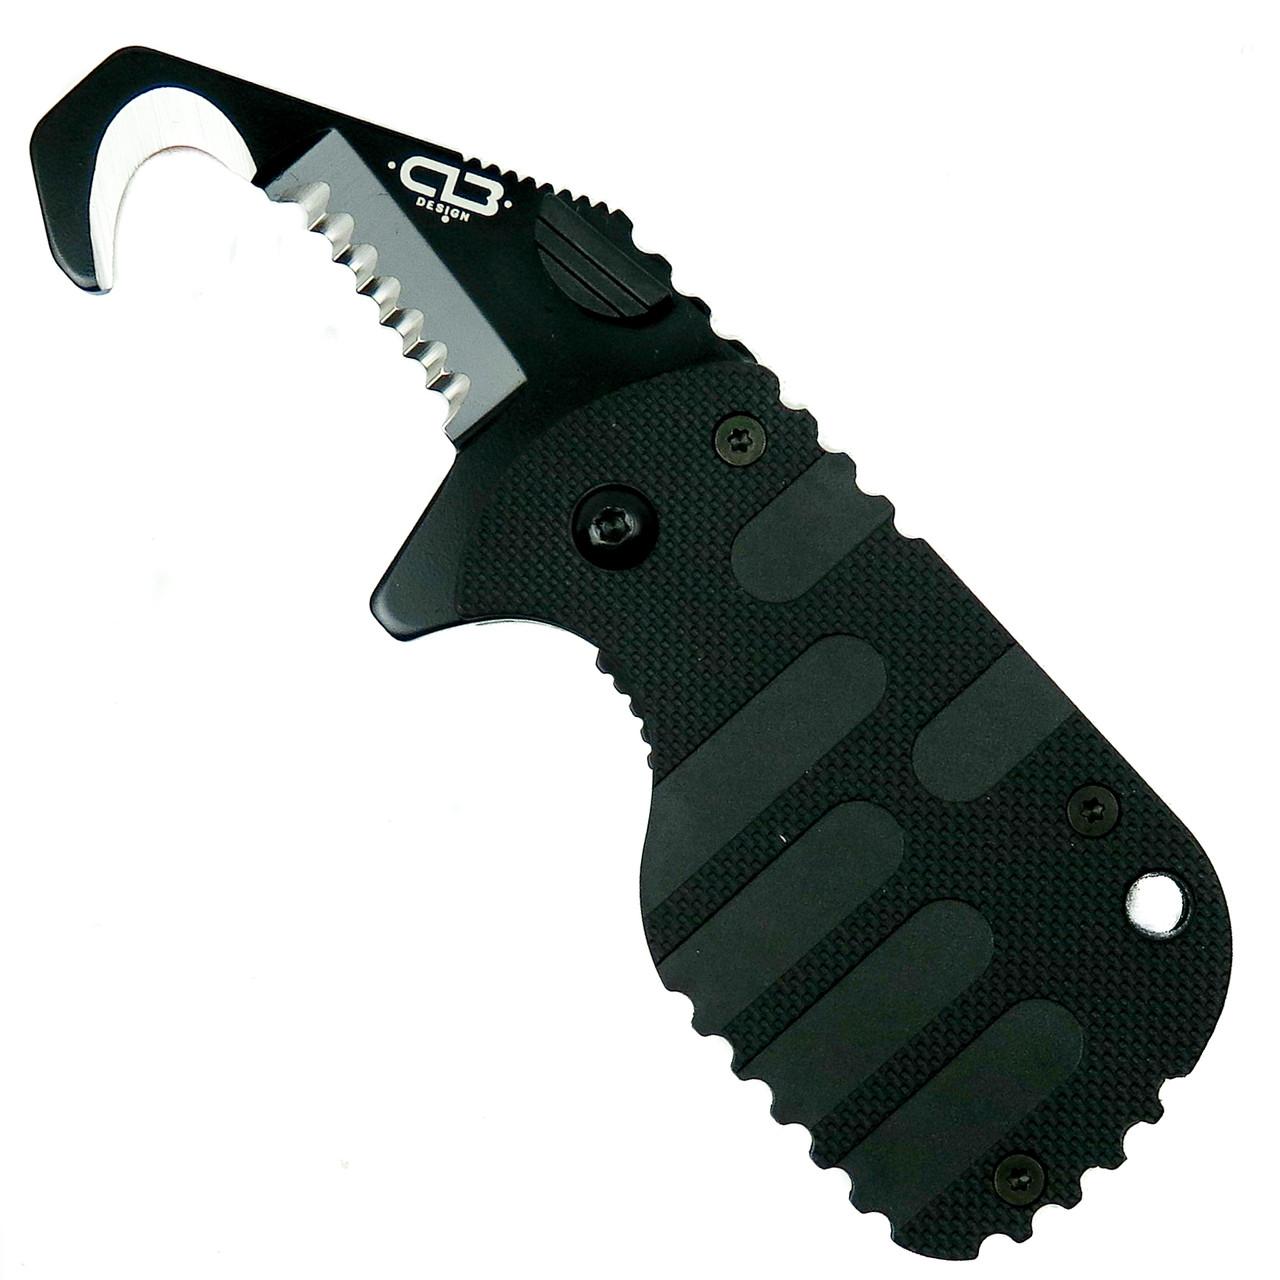 Boker Plus Rescom Tactical Rescue Knife, Black, 01BO583